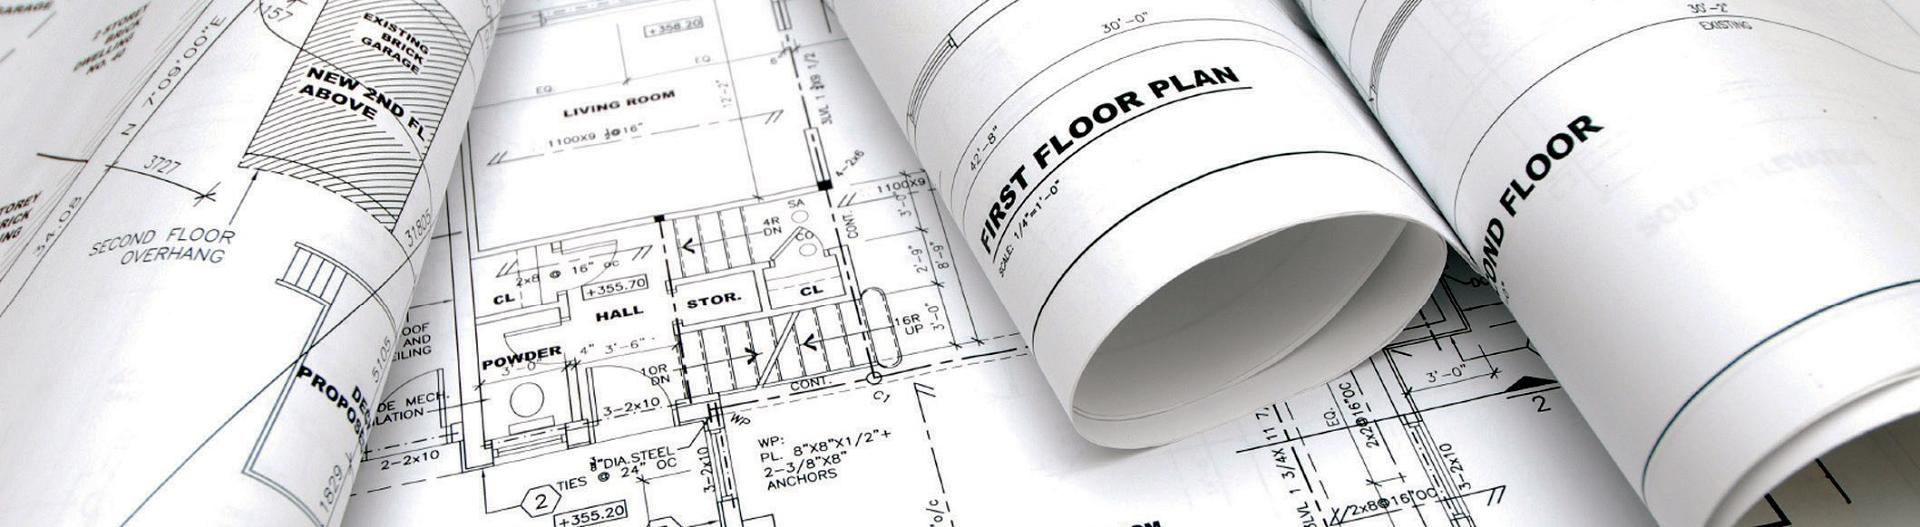 Planning-Permission 1920x527